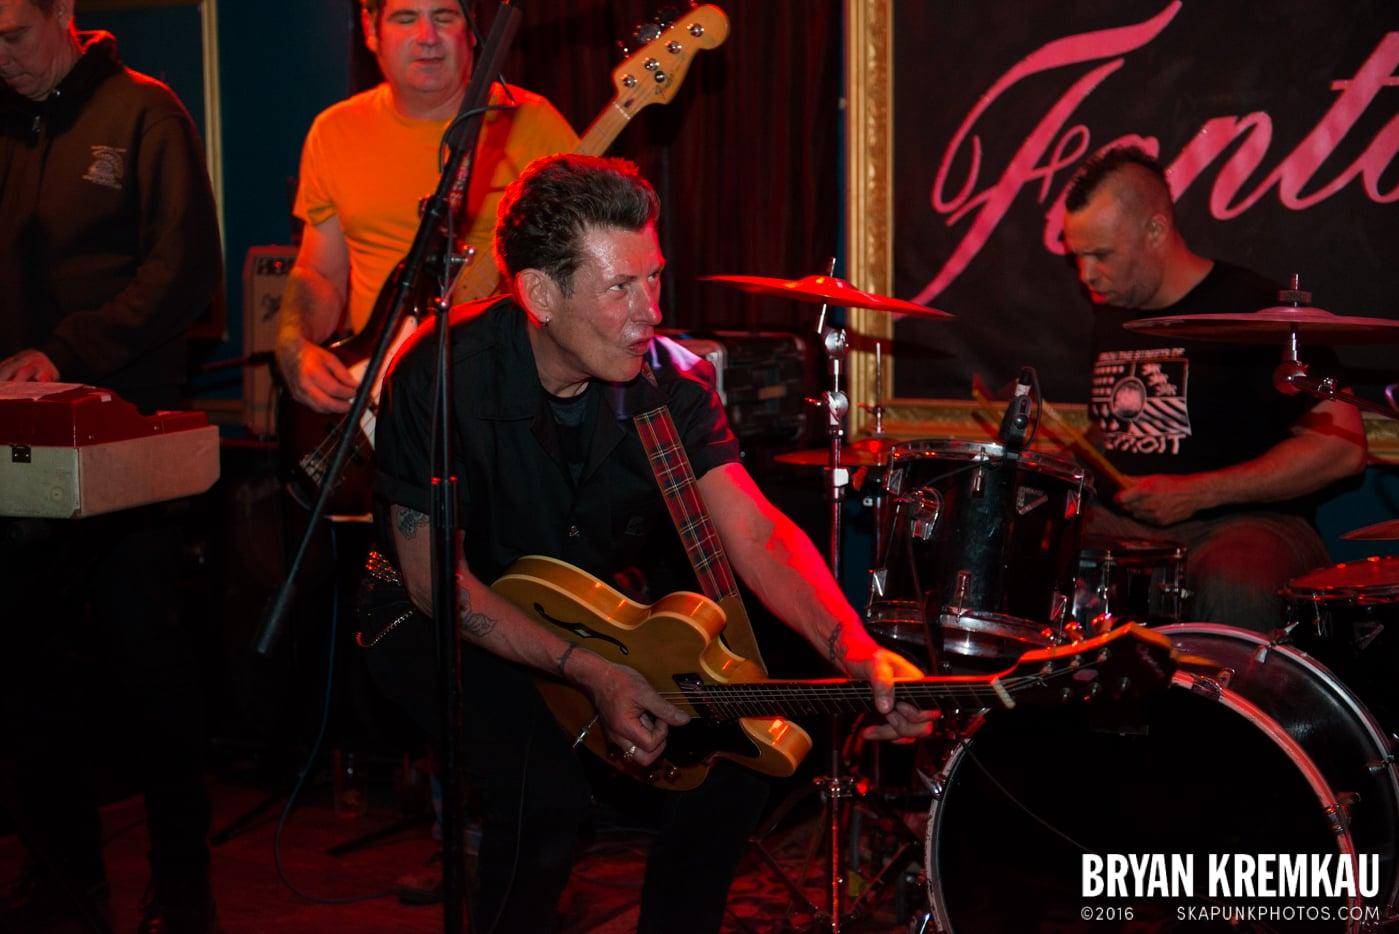 Roddy Radiation & The Scotch Bonnets @ Fontana's, NYC - 4.25.15 (2)